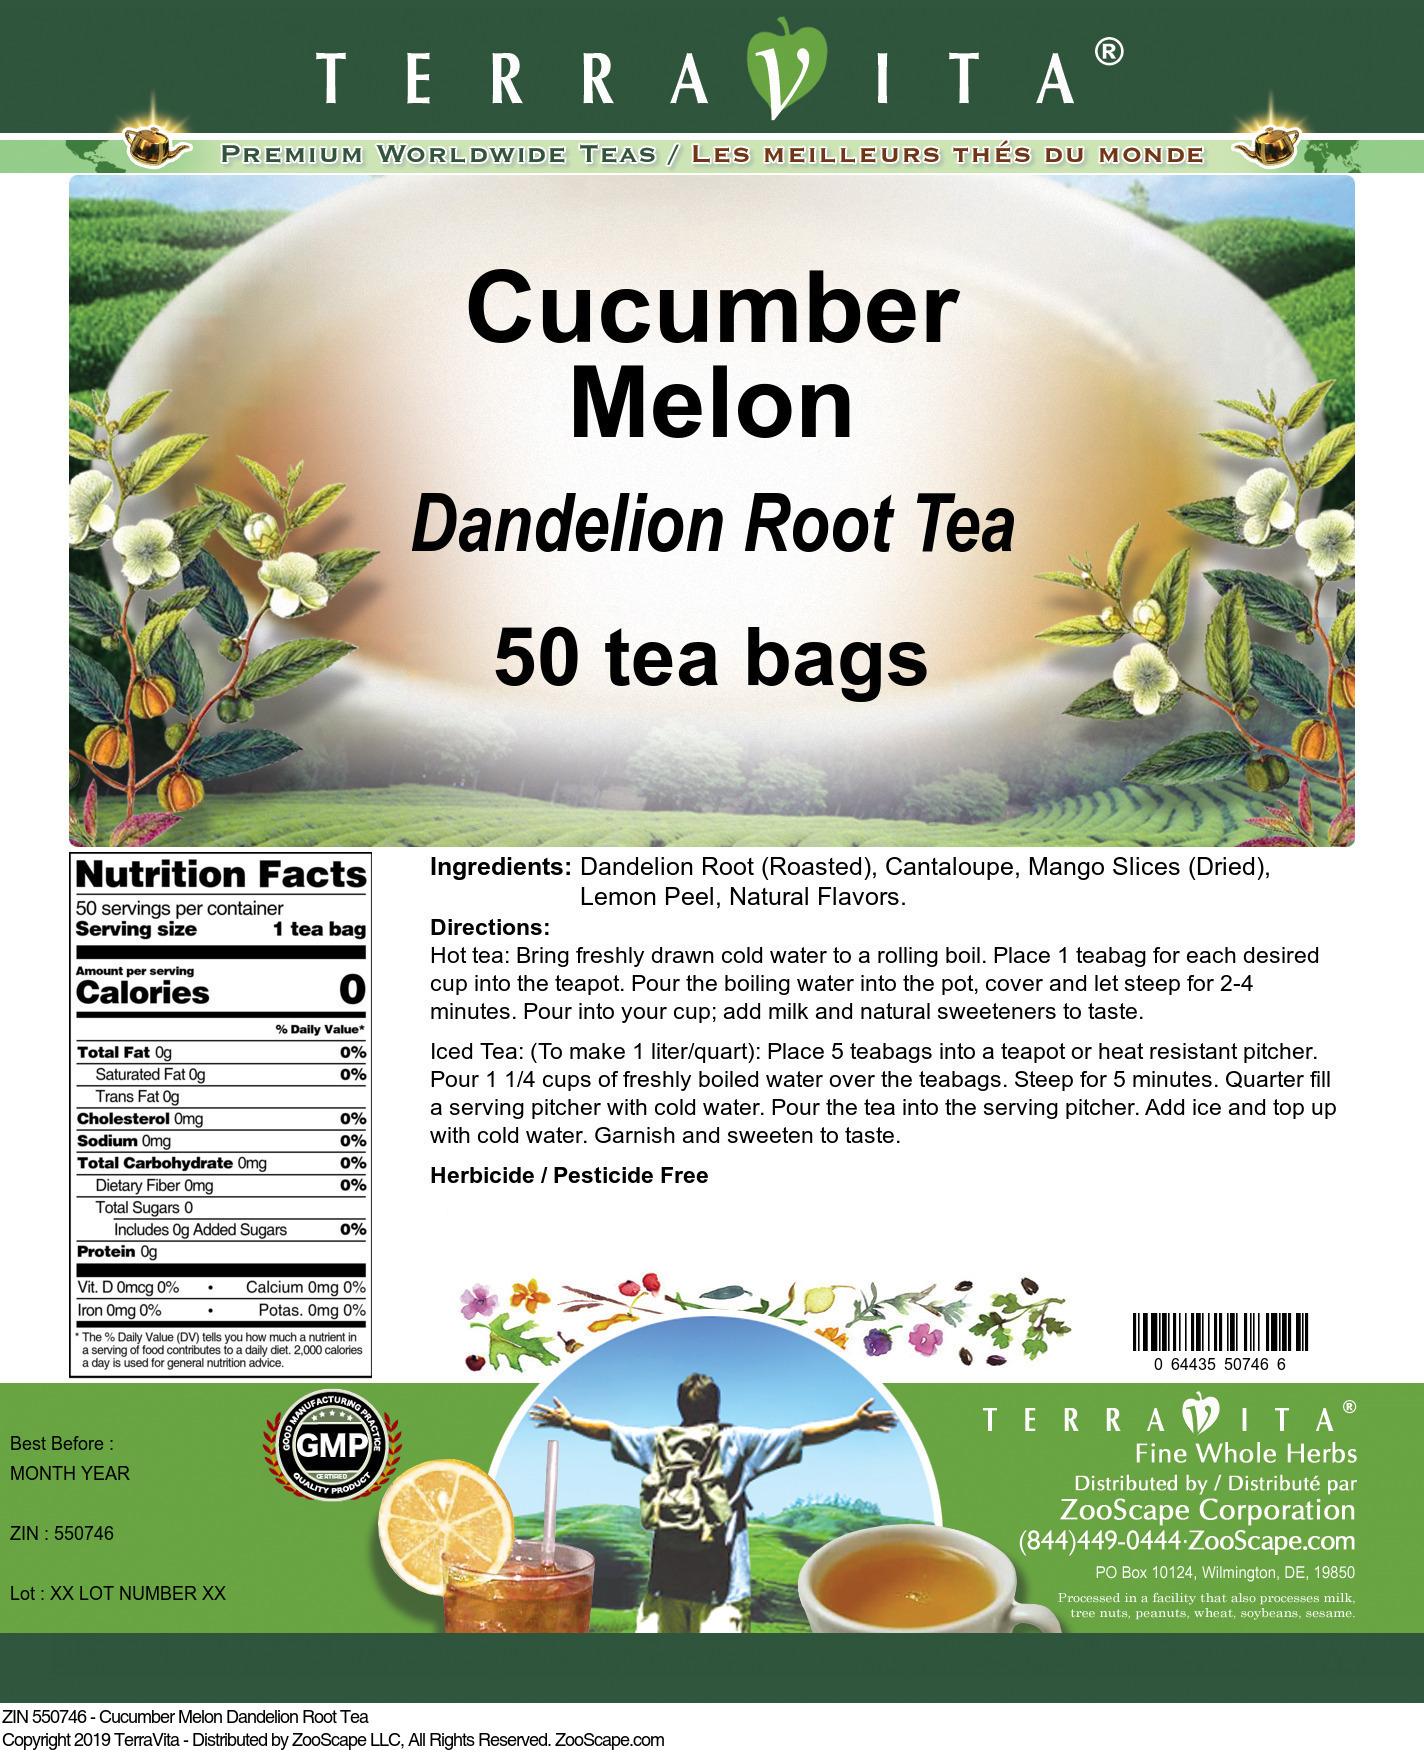 Cucumber Melon Dandelion Root